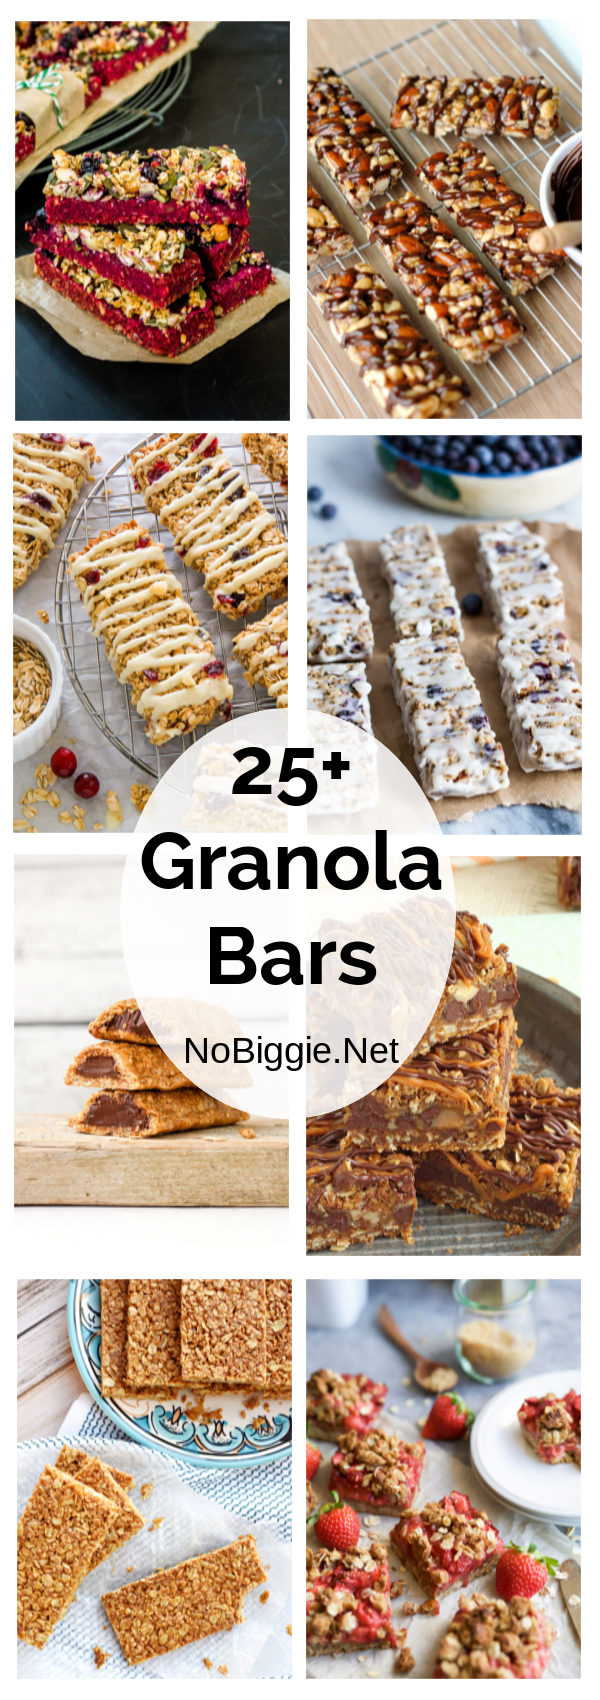 25+ Granola Bars | NoBiggie.net